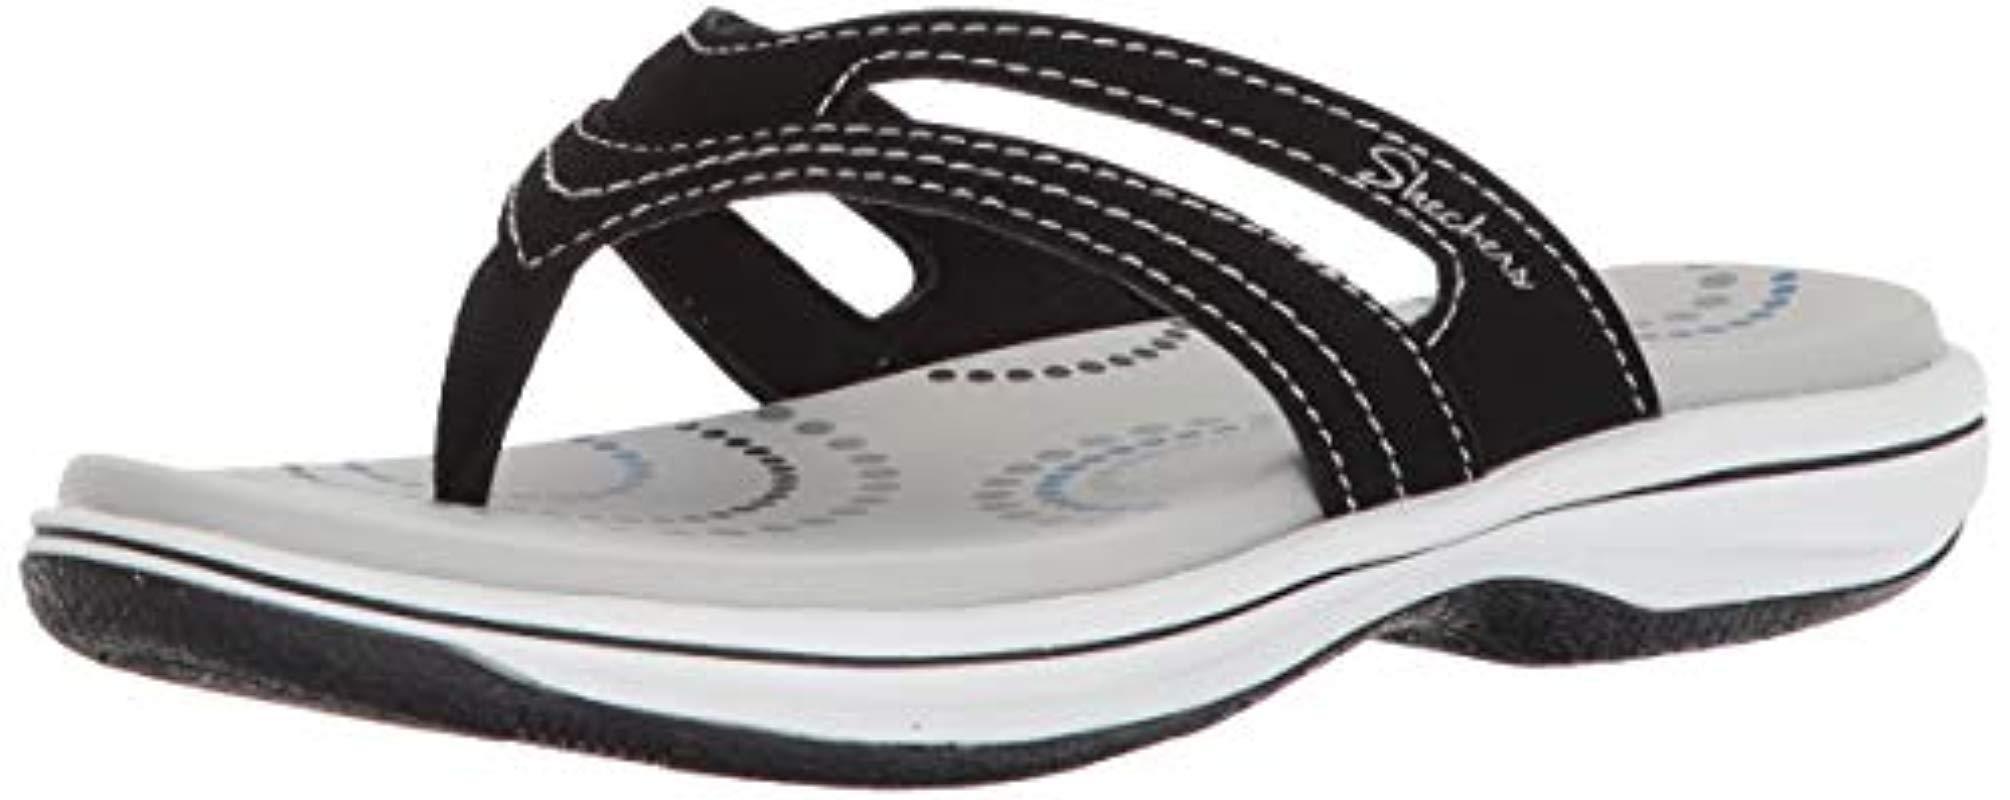 c5bbc73de282 Skechers. Women s Black Bayshore-hidden Springs-contrast Stitching Thong  Flip-flop